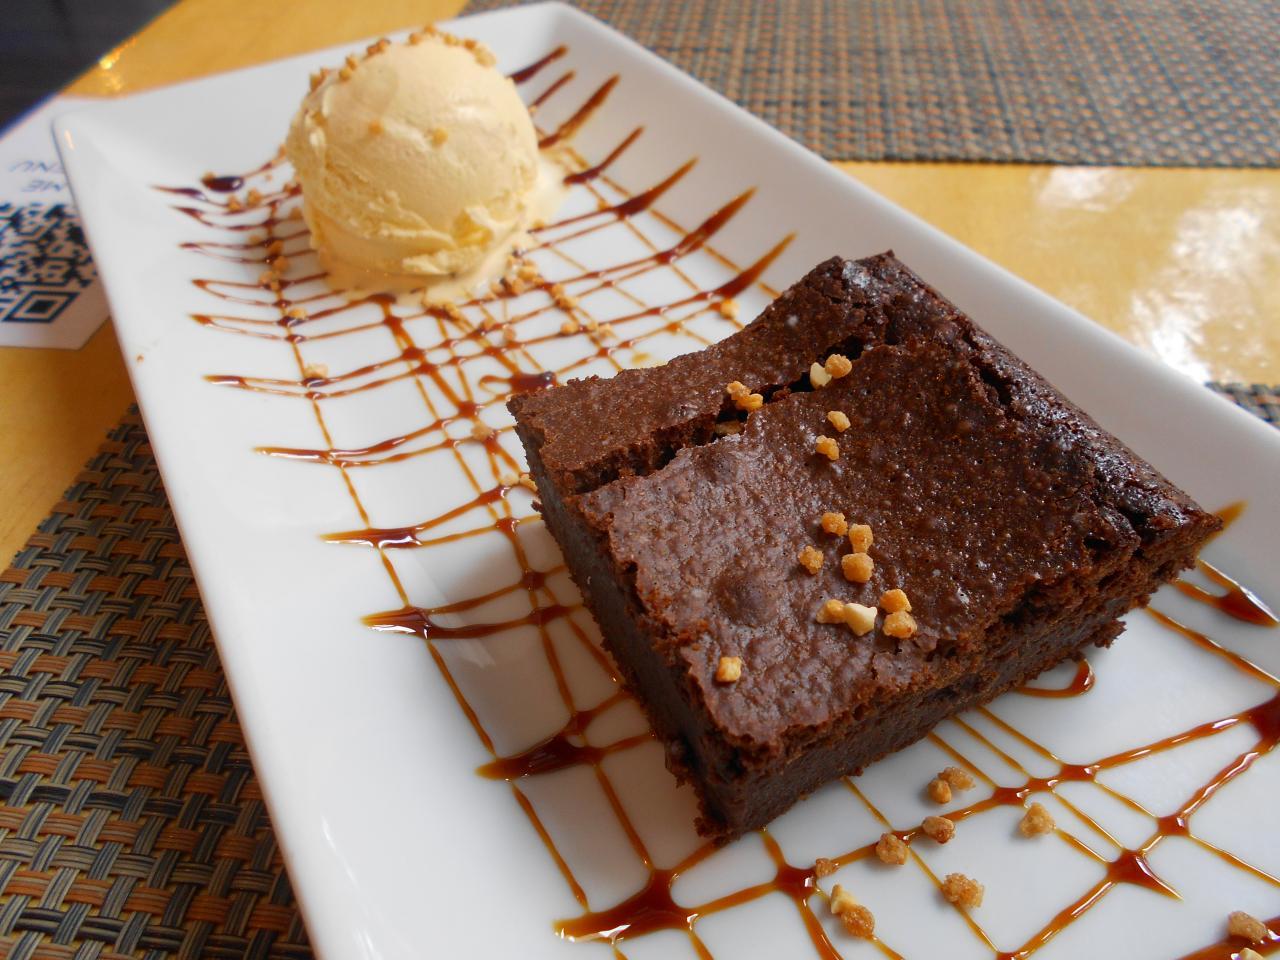 Brownie y helado